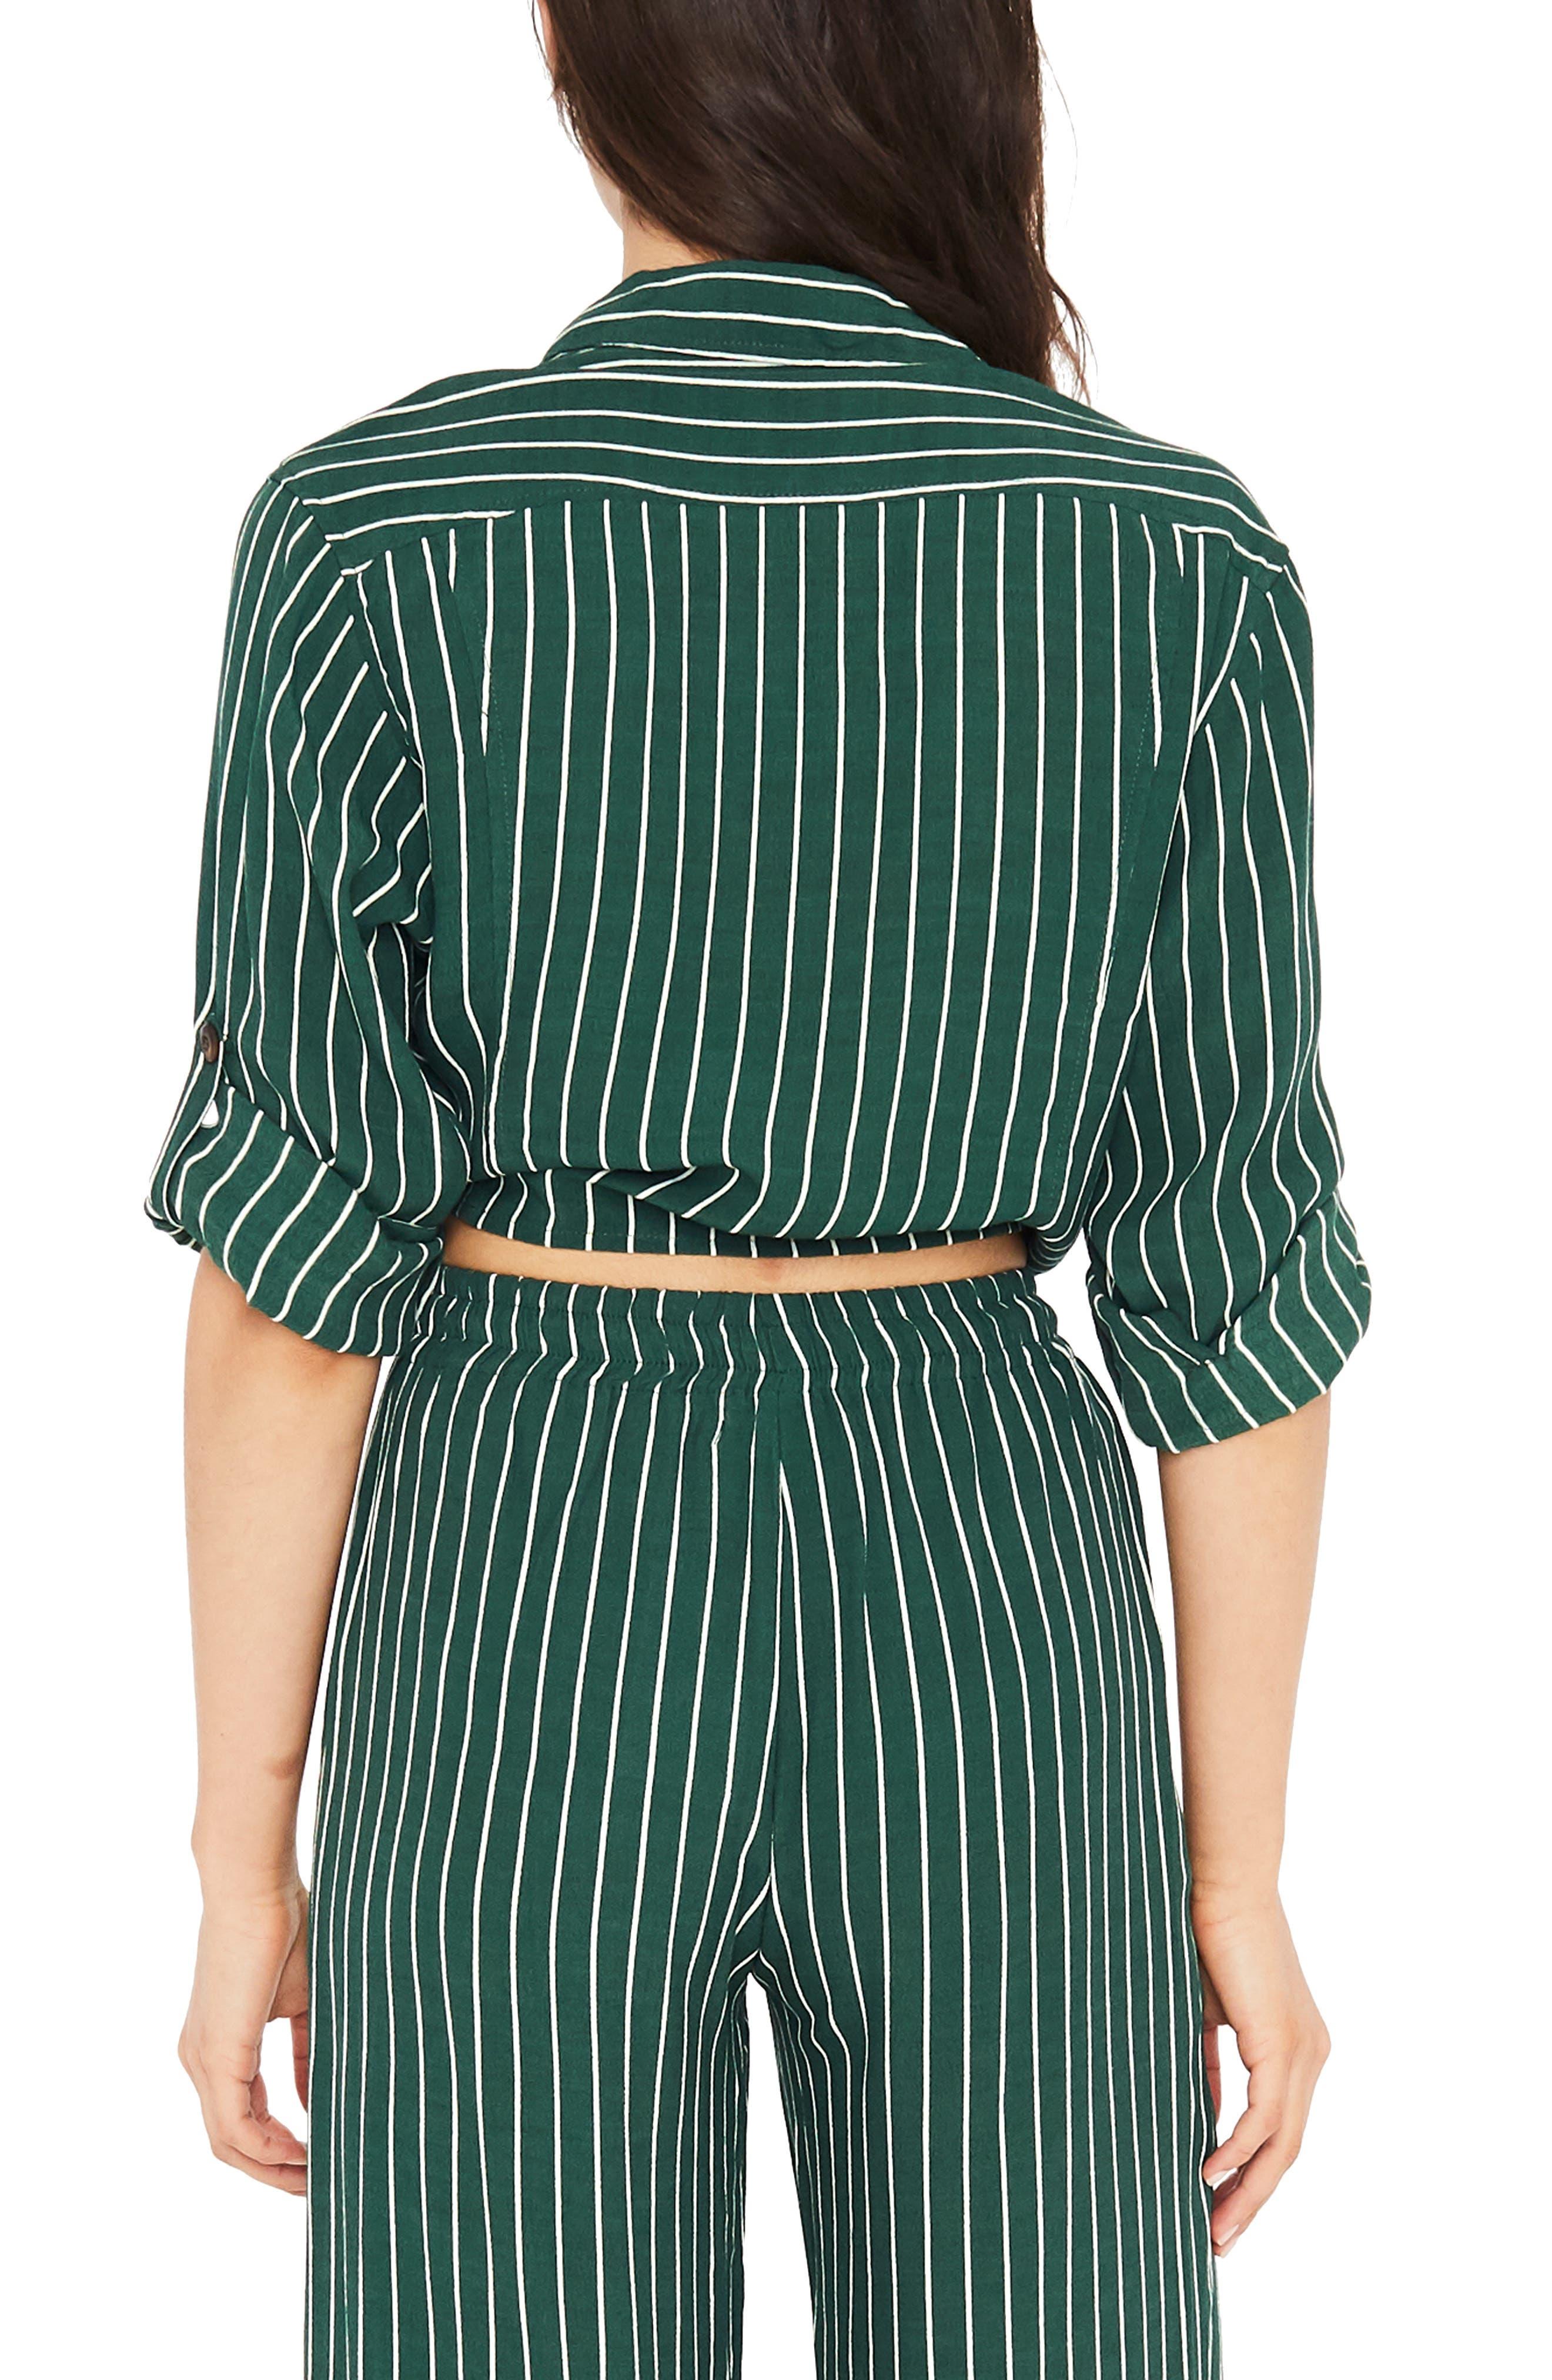 Beau Rivage Stripe Tie Shirt,                             Alternate thumbnail 2, color,                             300